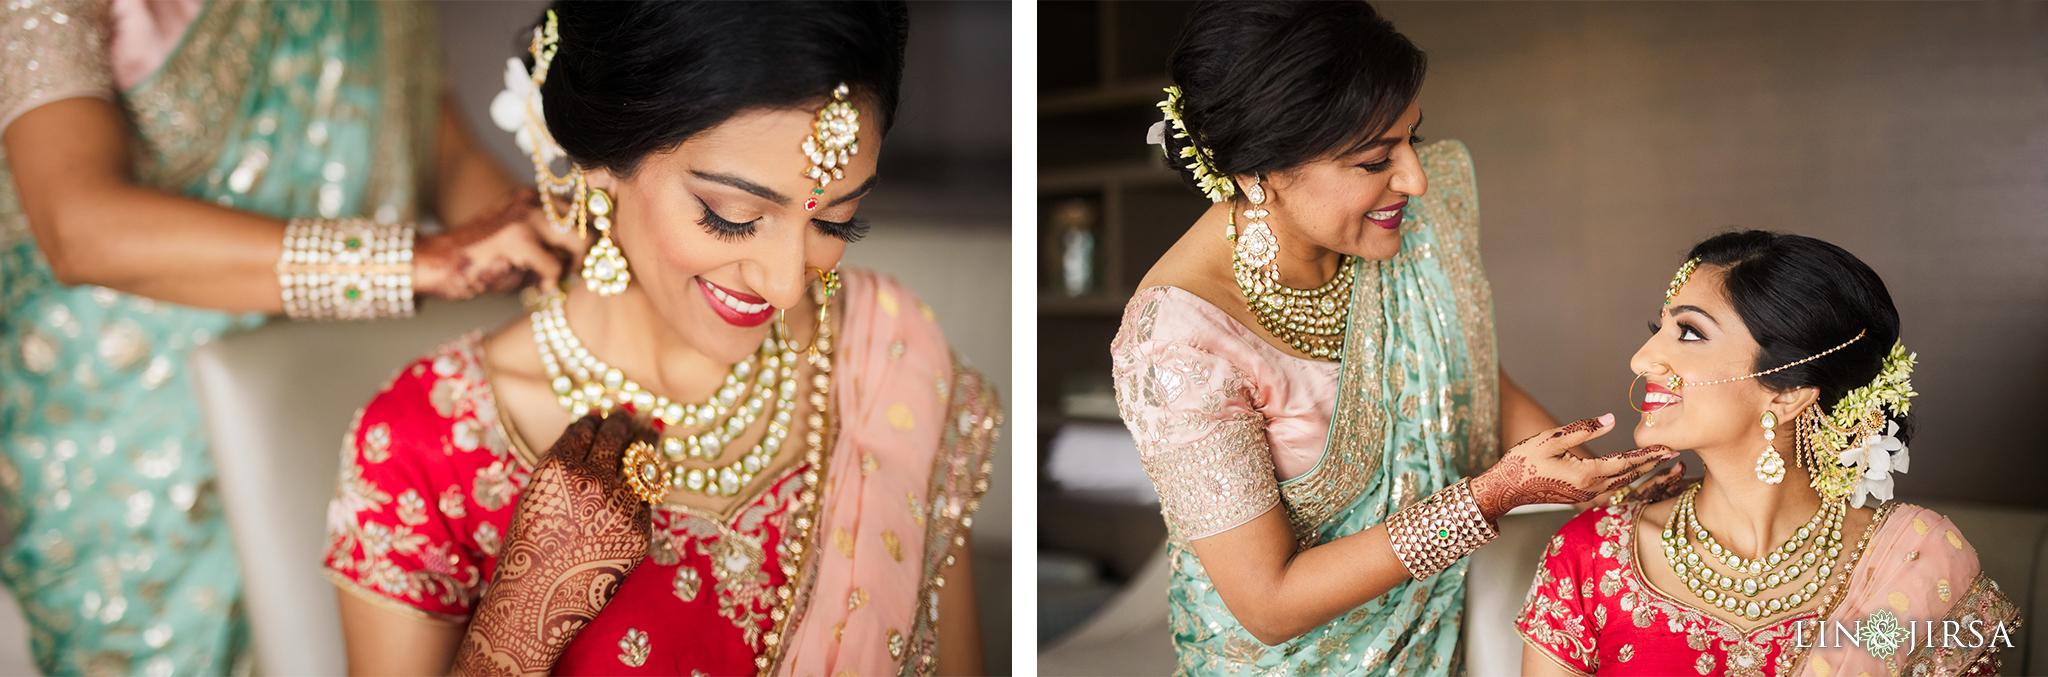 06 Ritz Carlton Laguna Niguel Indian Wedding Photography